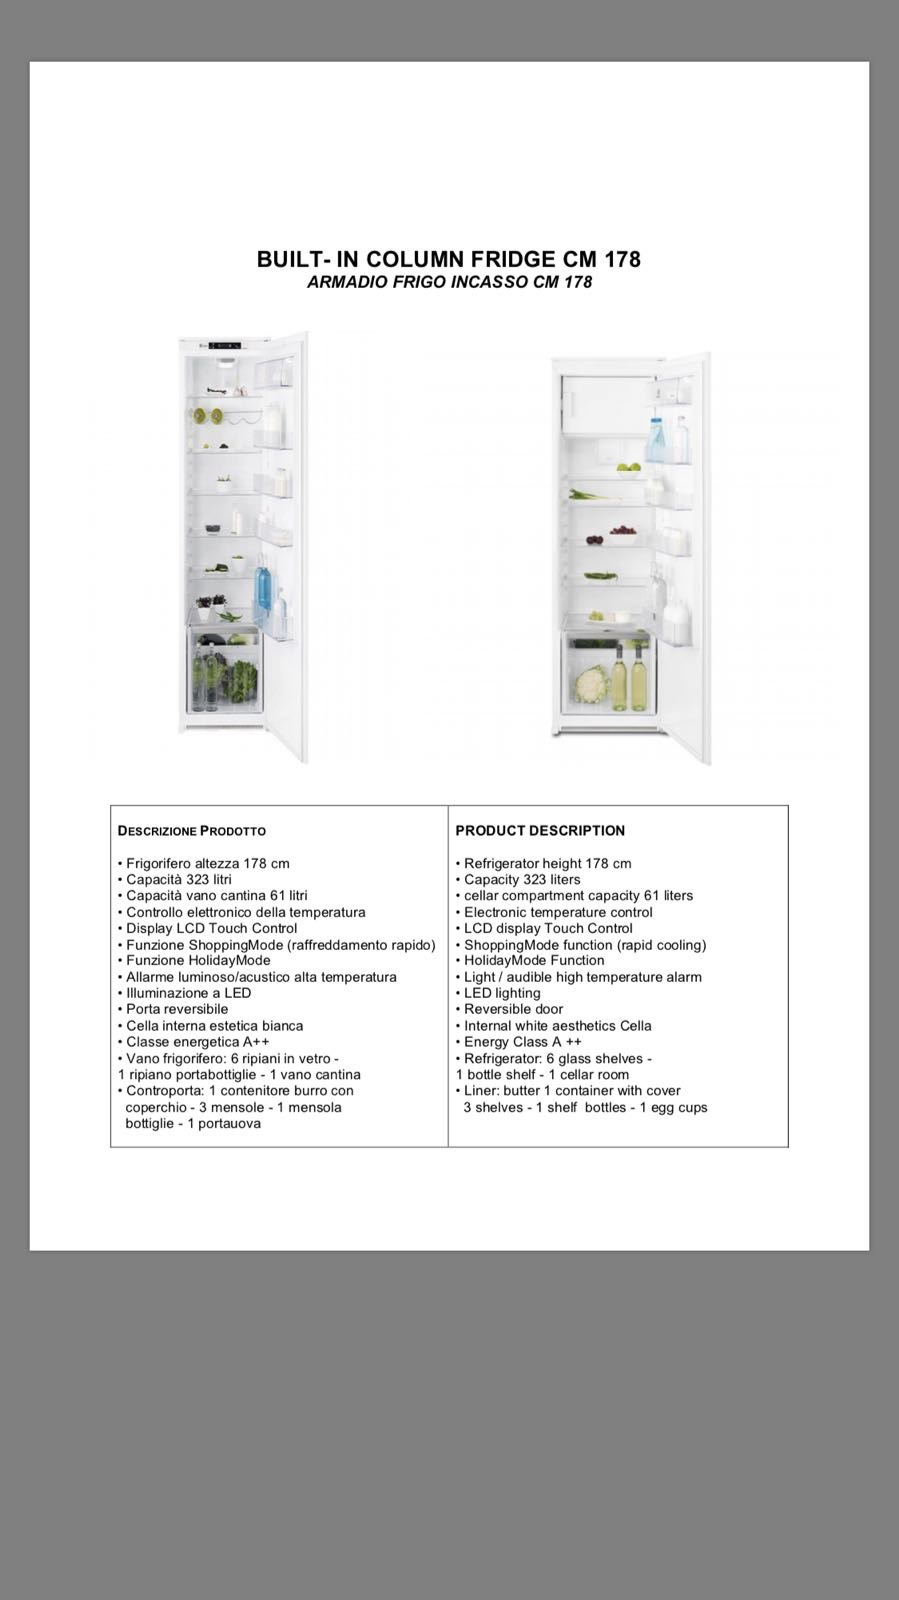 Mensole In Vetro Luminose.Freezer Europestock Offers Global Stocks